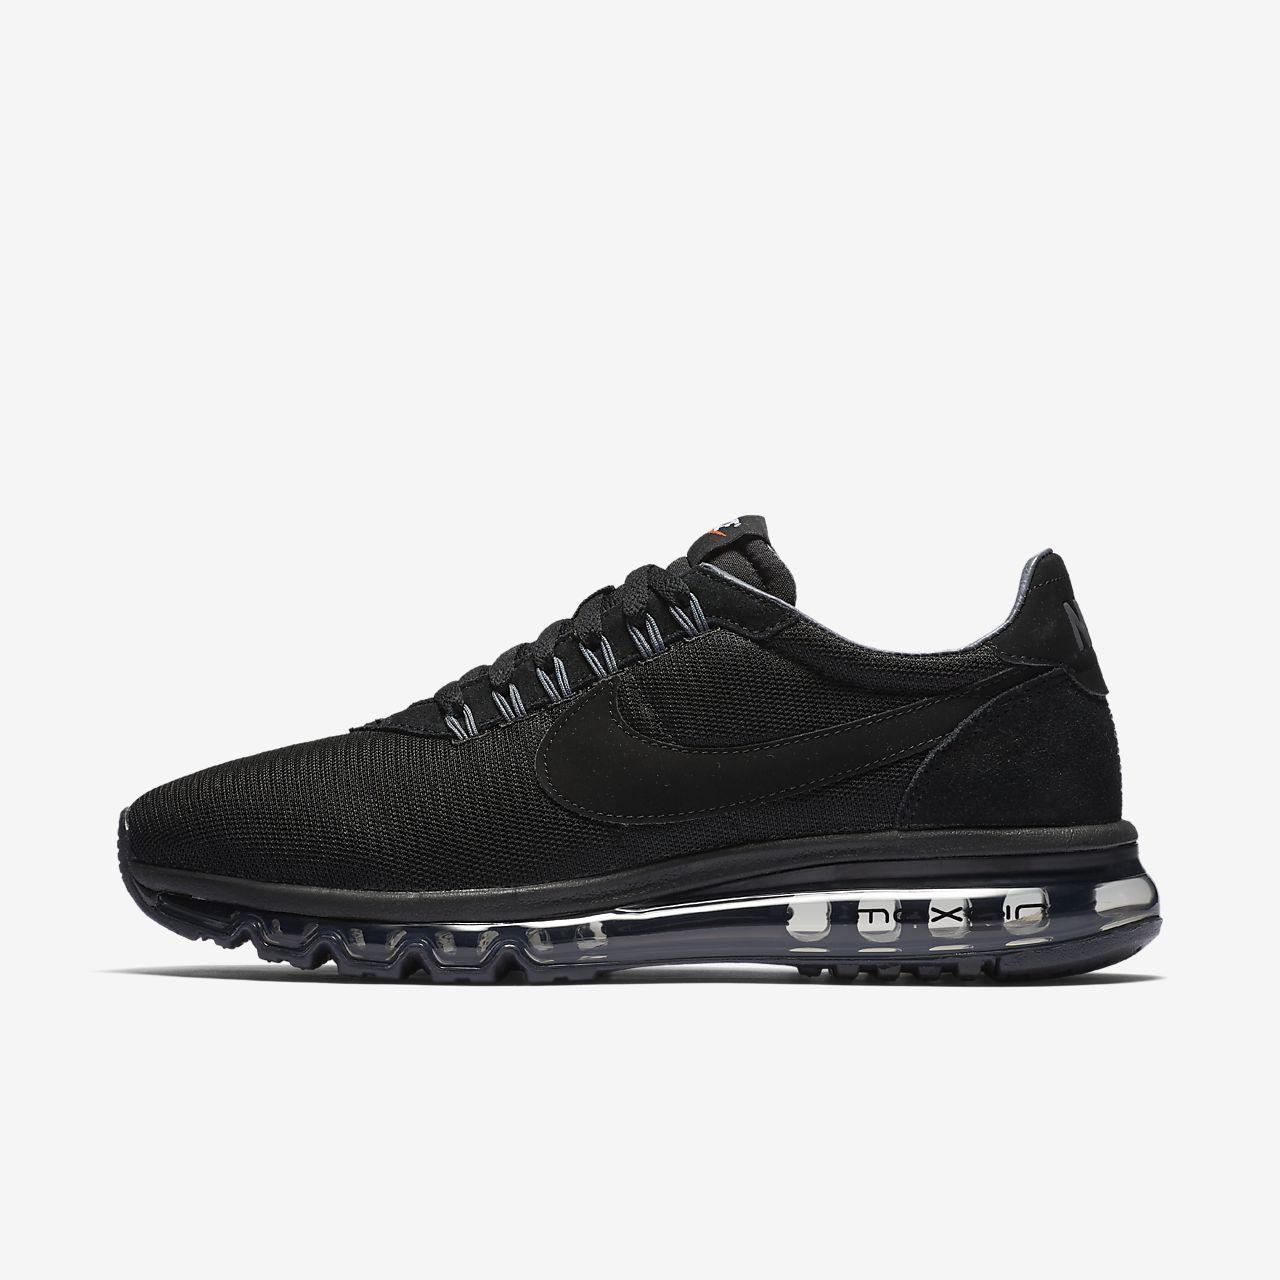 new arrivals cc383 5835f ... Calzado unisex Nike Air Max LD-Zero